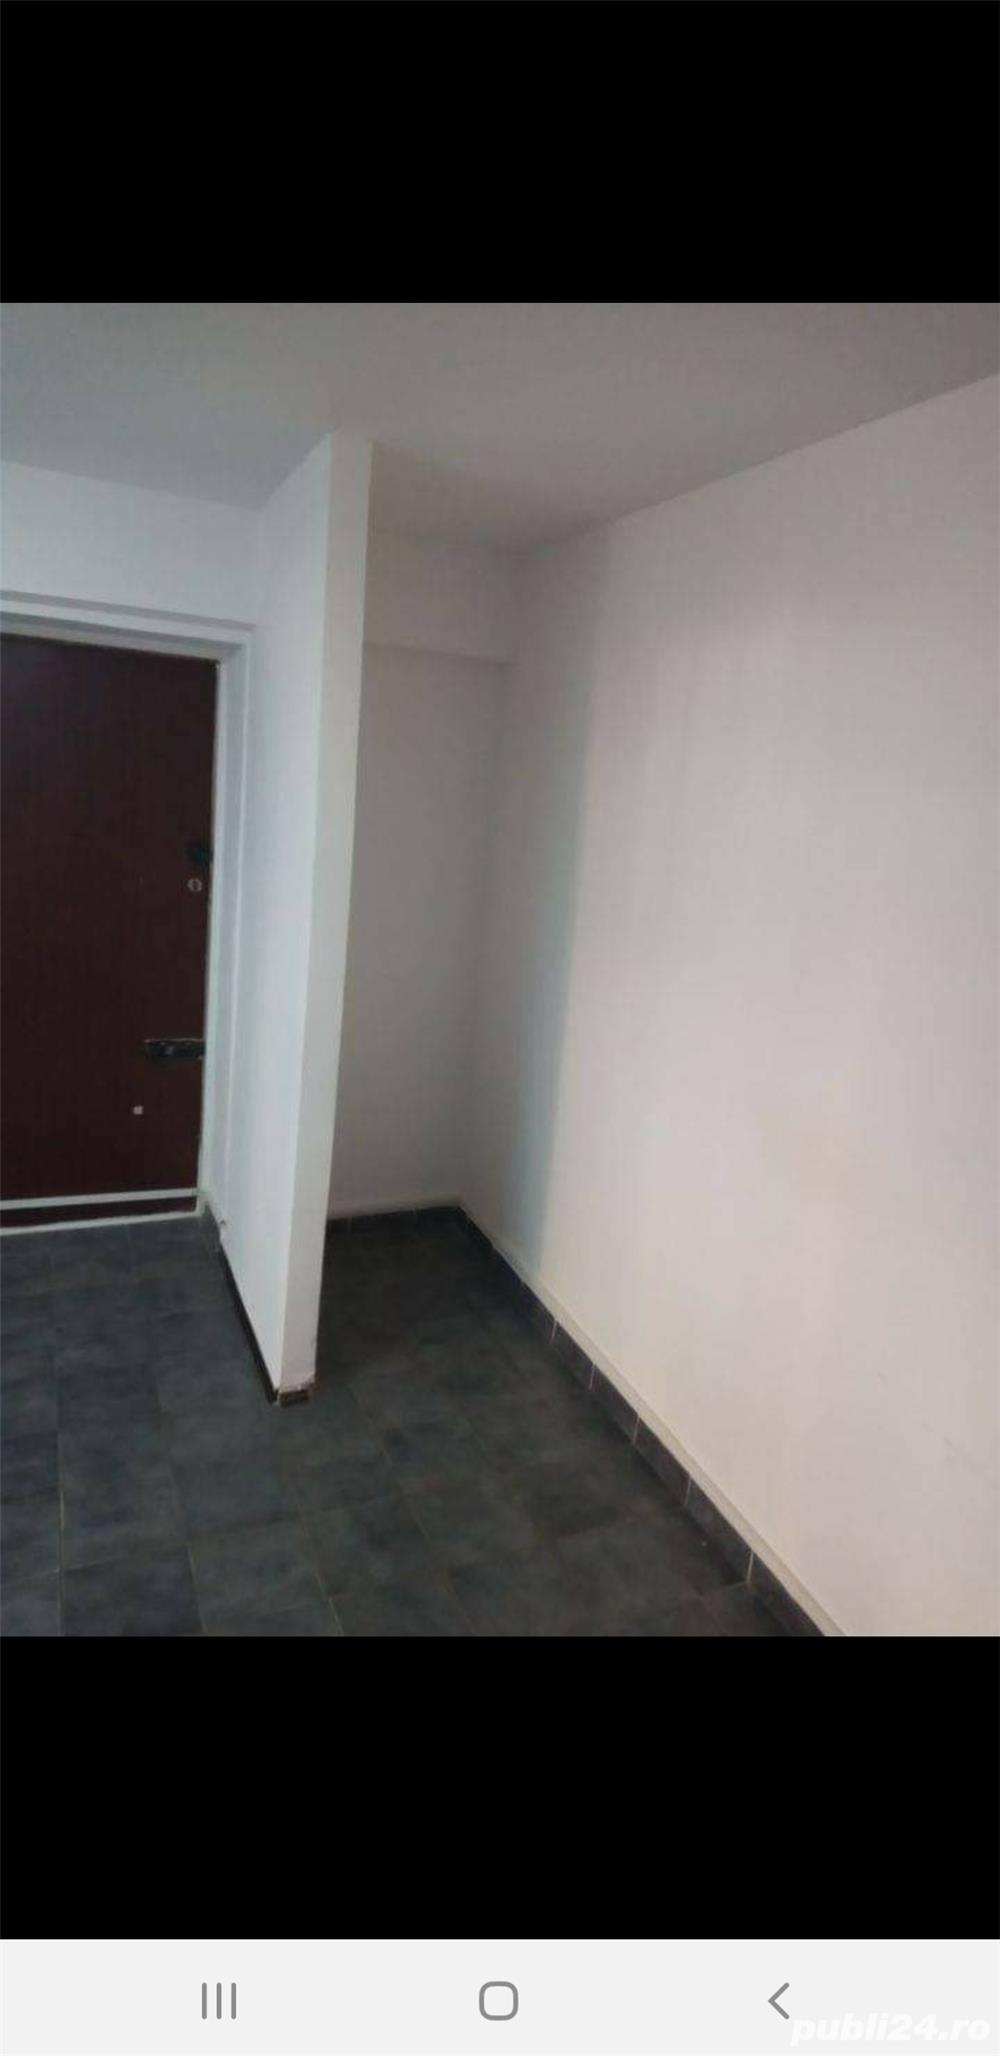 Închiriez spațiu comercial pentru sediu firma , birou, zona Iulius mall 25 mp, intrare din strada